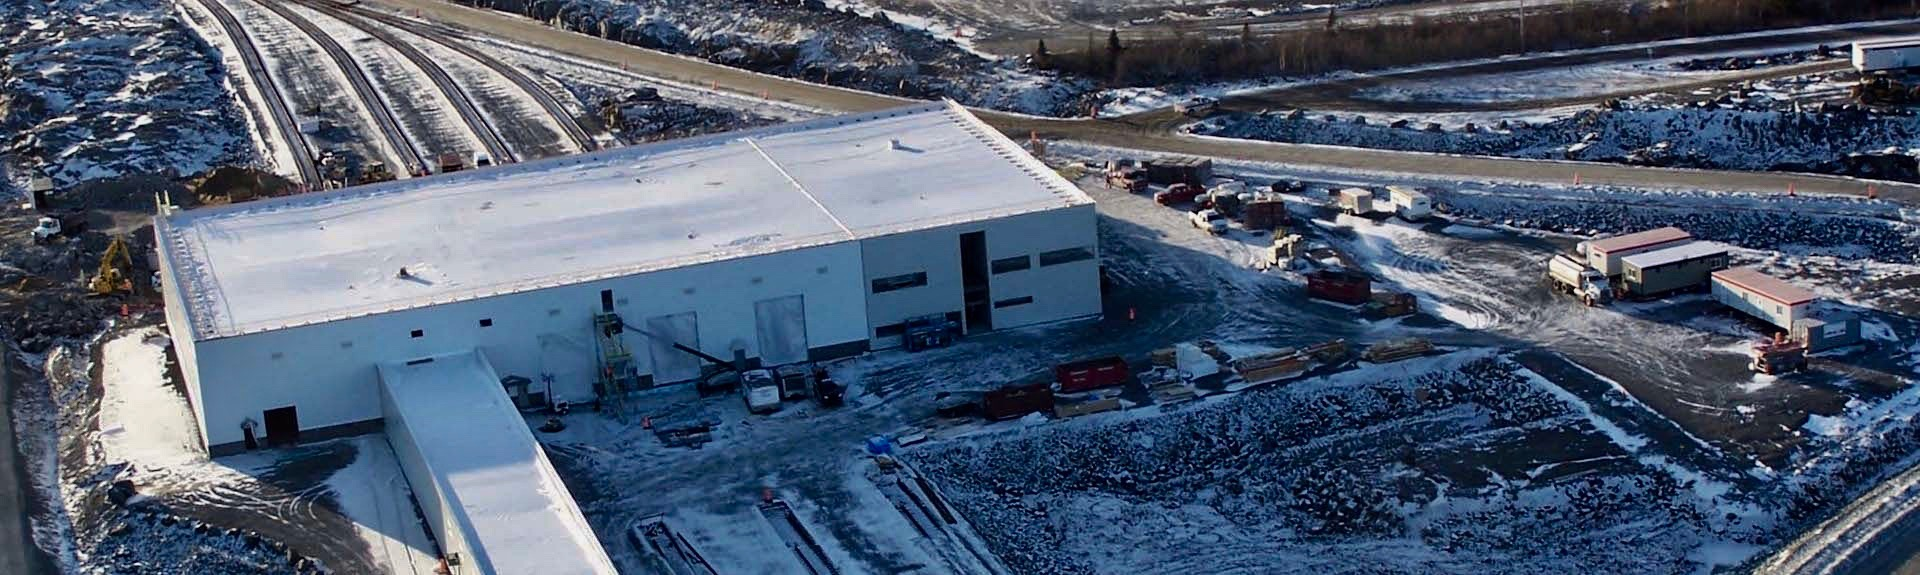 Vue des travaux de constrution de l'usine d'ArcelorMittal Canada, Port-Cartier, Québec